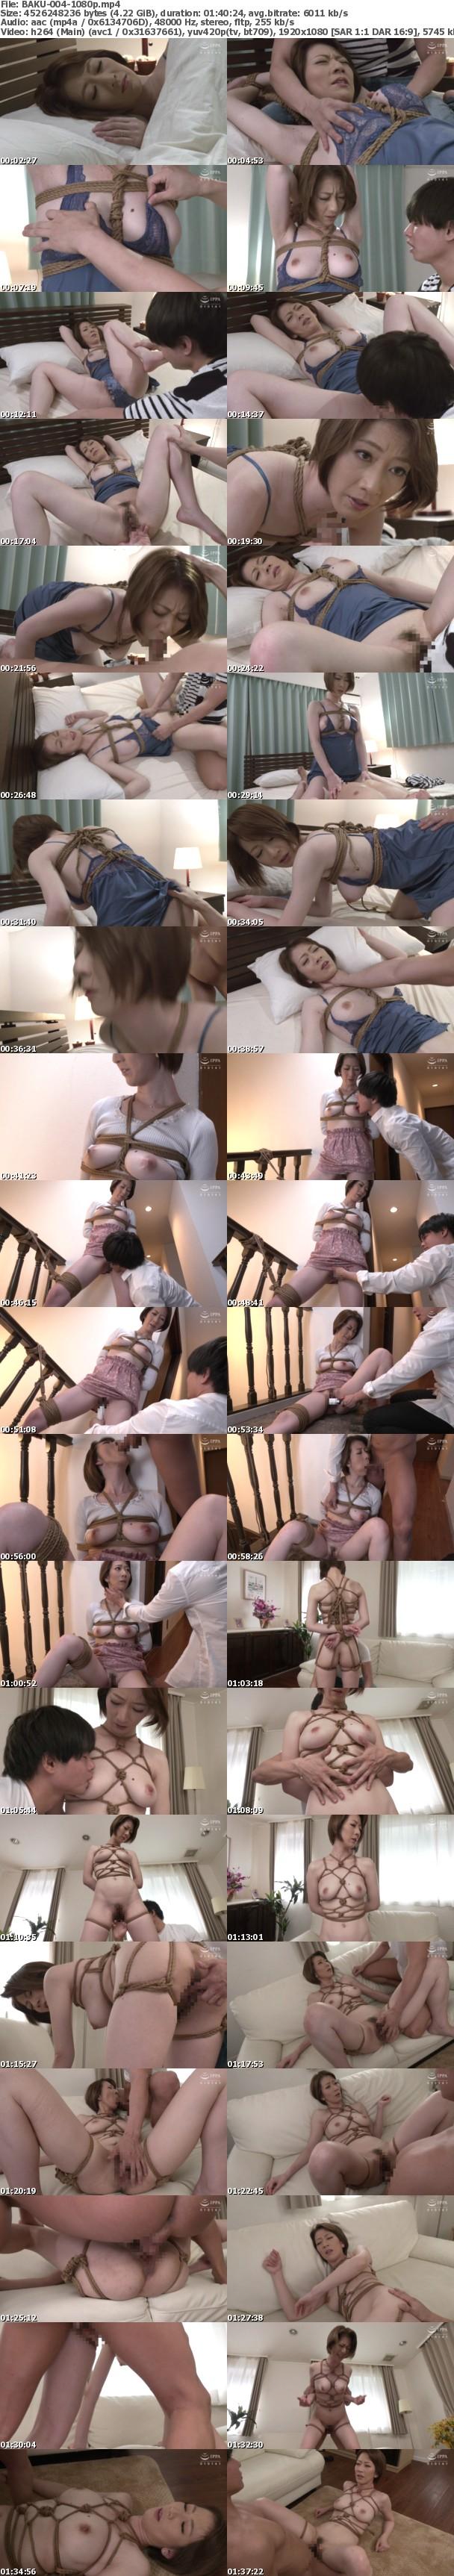 (Full HD) BAKU-004 緊縛相姦~母親の自由を麻縄で奪いひたすらイカせ続けて中出しする息子~ 岡村麻友子